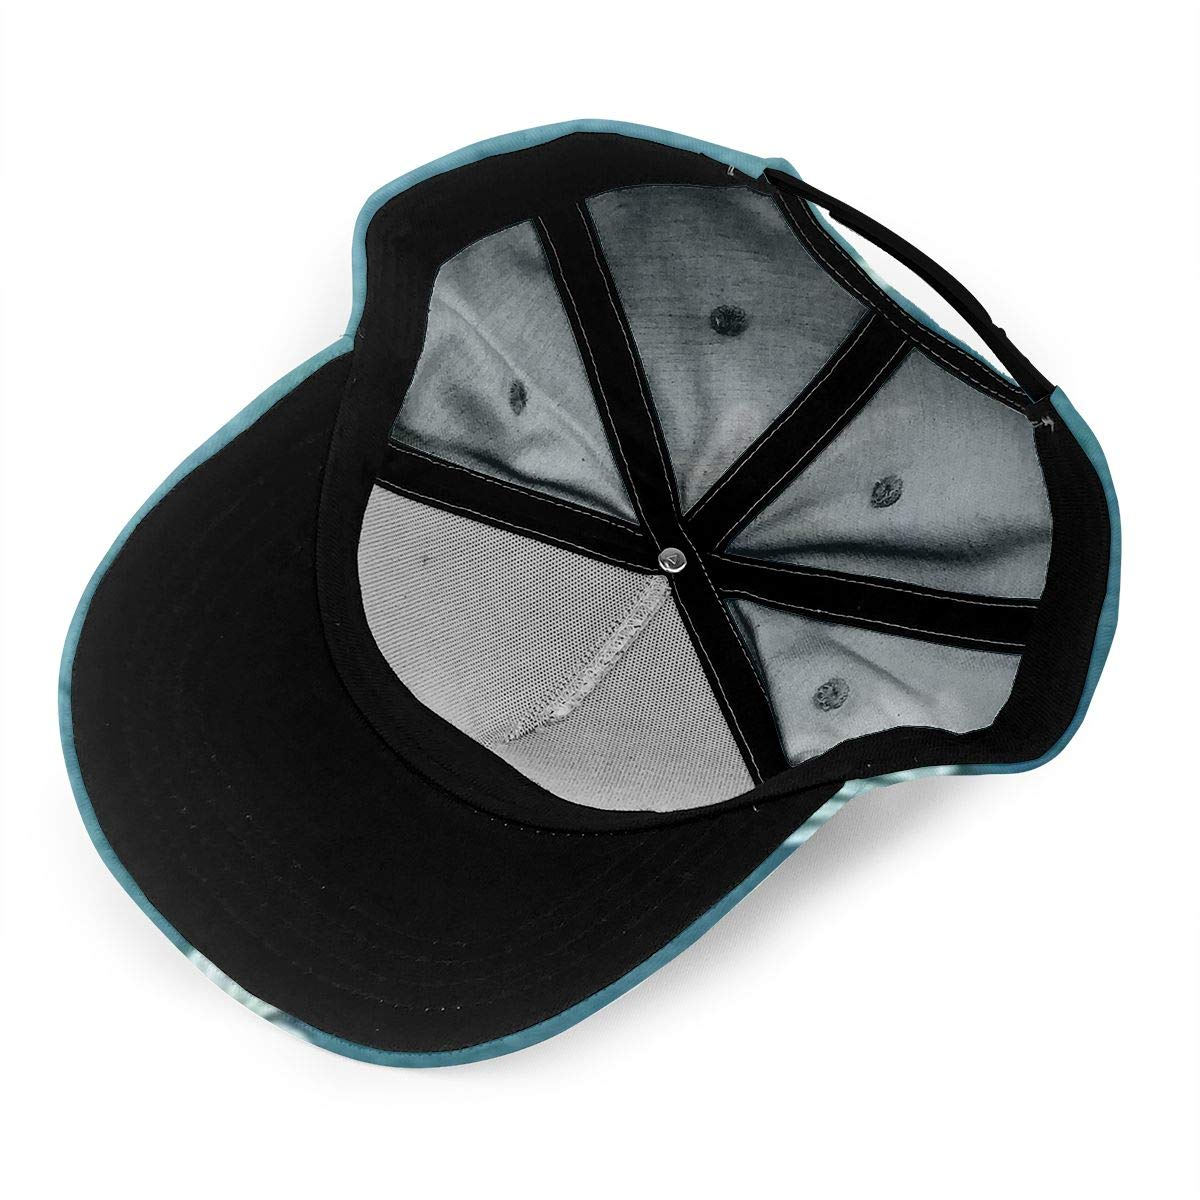 SKOKT Oxeye Daisy Printing Fashion Classic Baseball Cap Unisex Adjustable Velcro